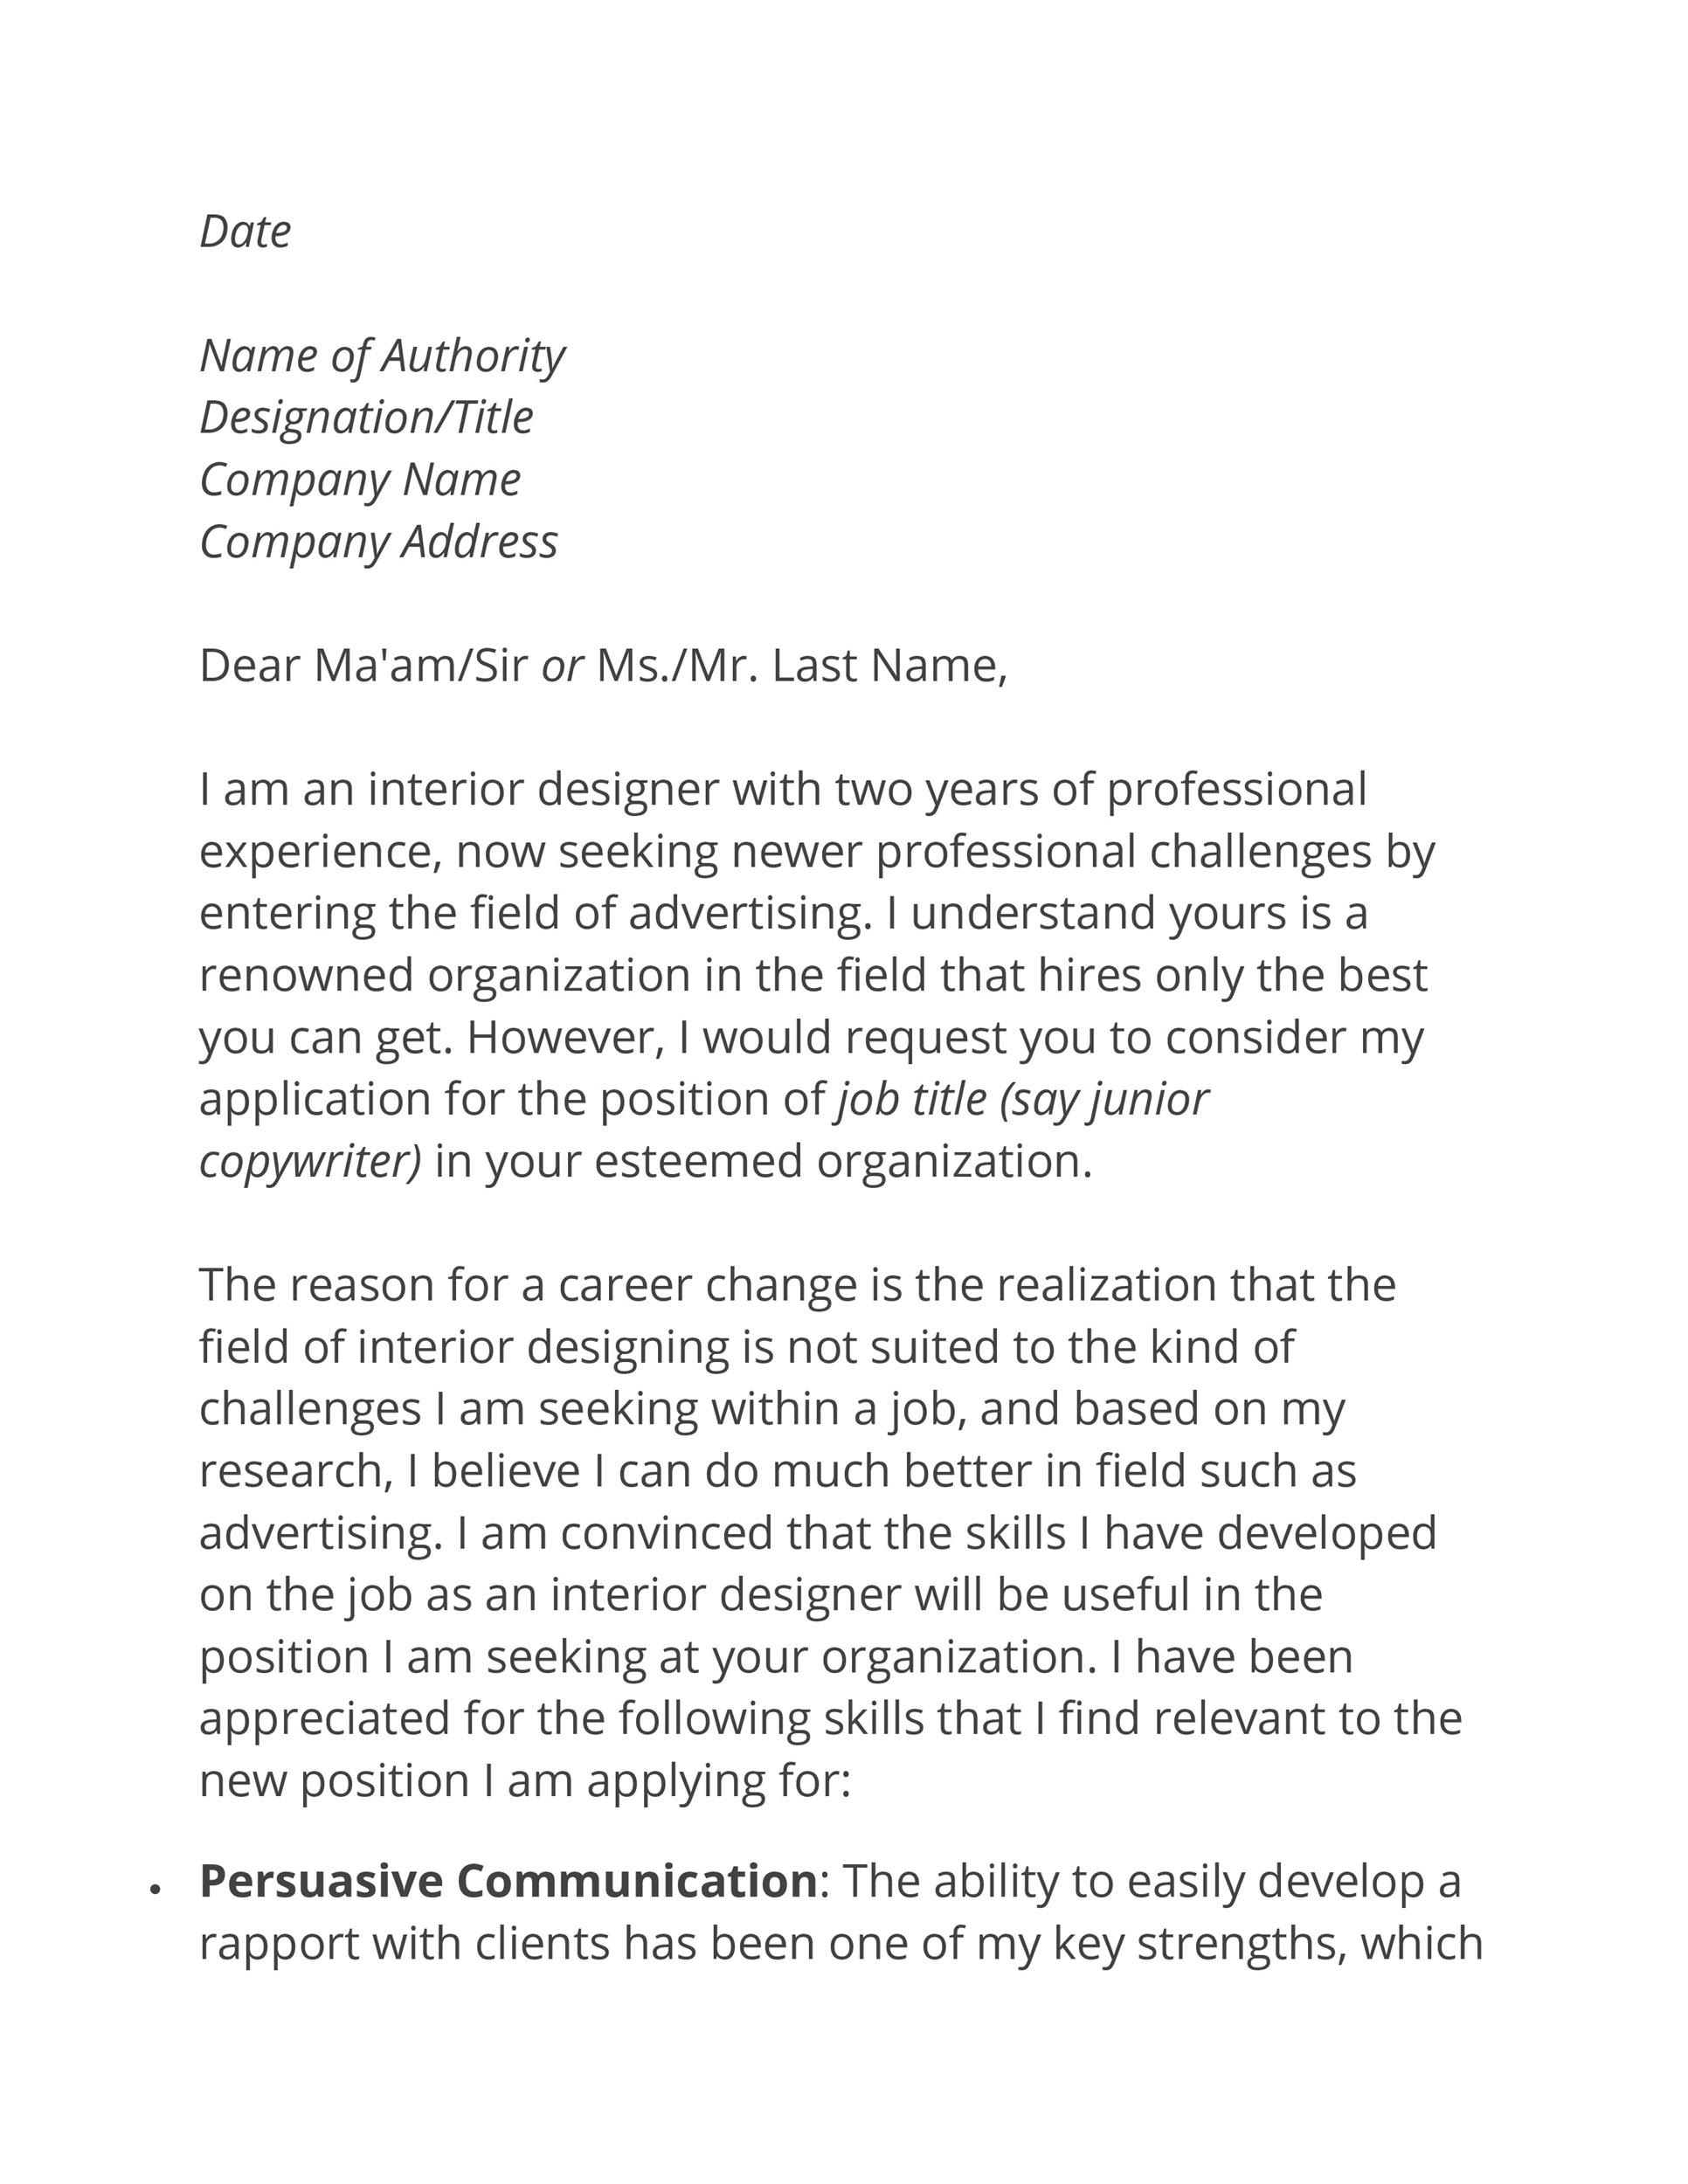 persuasive career change cover letter